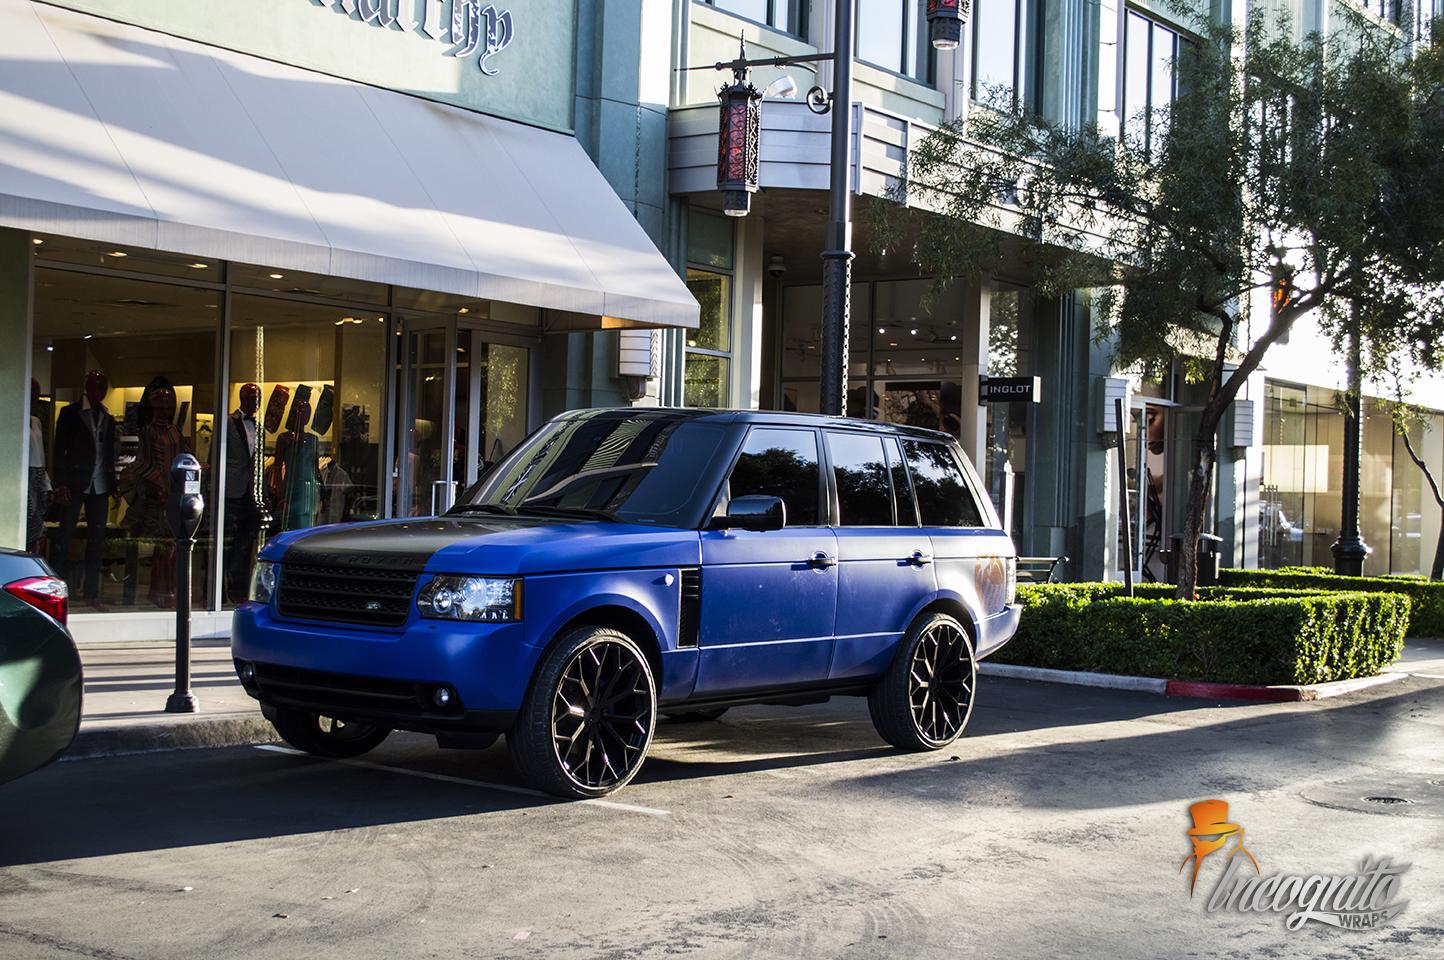 Range Rover Satin Blue